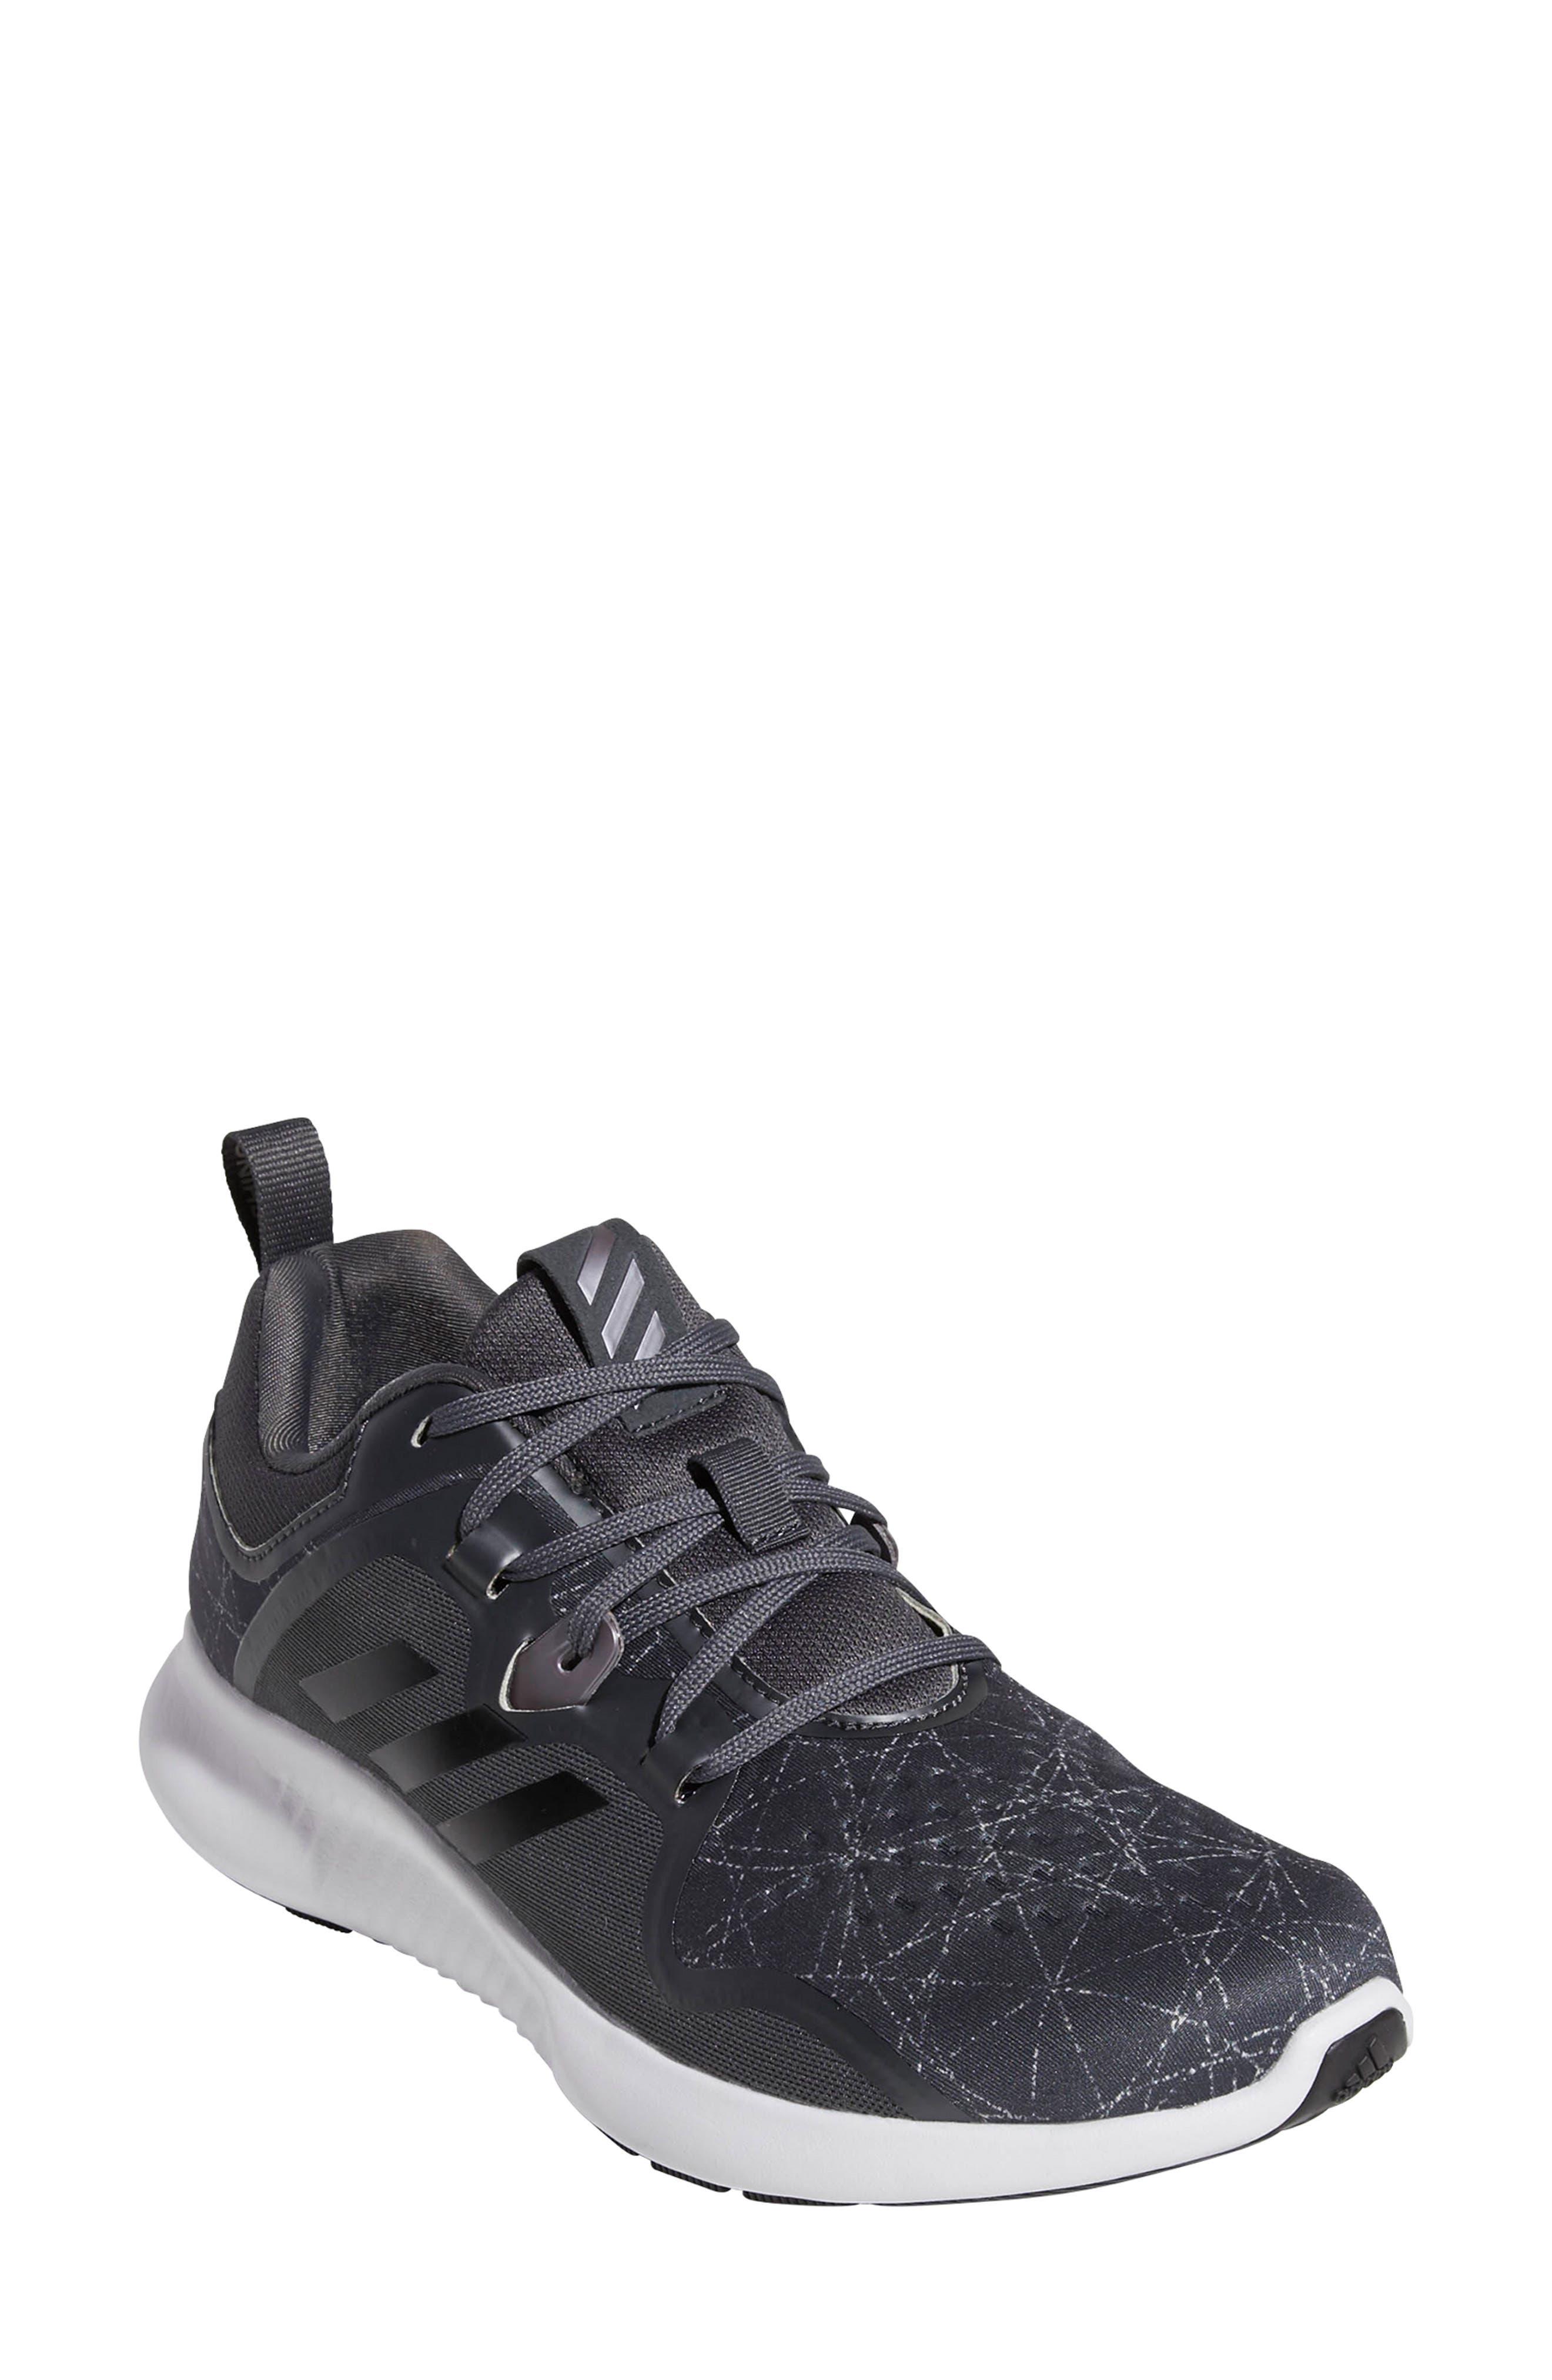 designer fashion c6909 a56c1 cross training shoes   Nordstrom